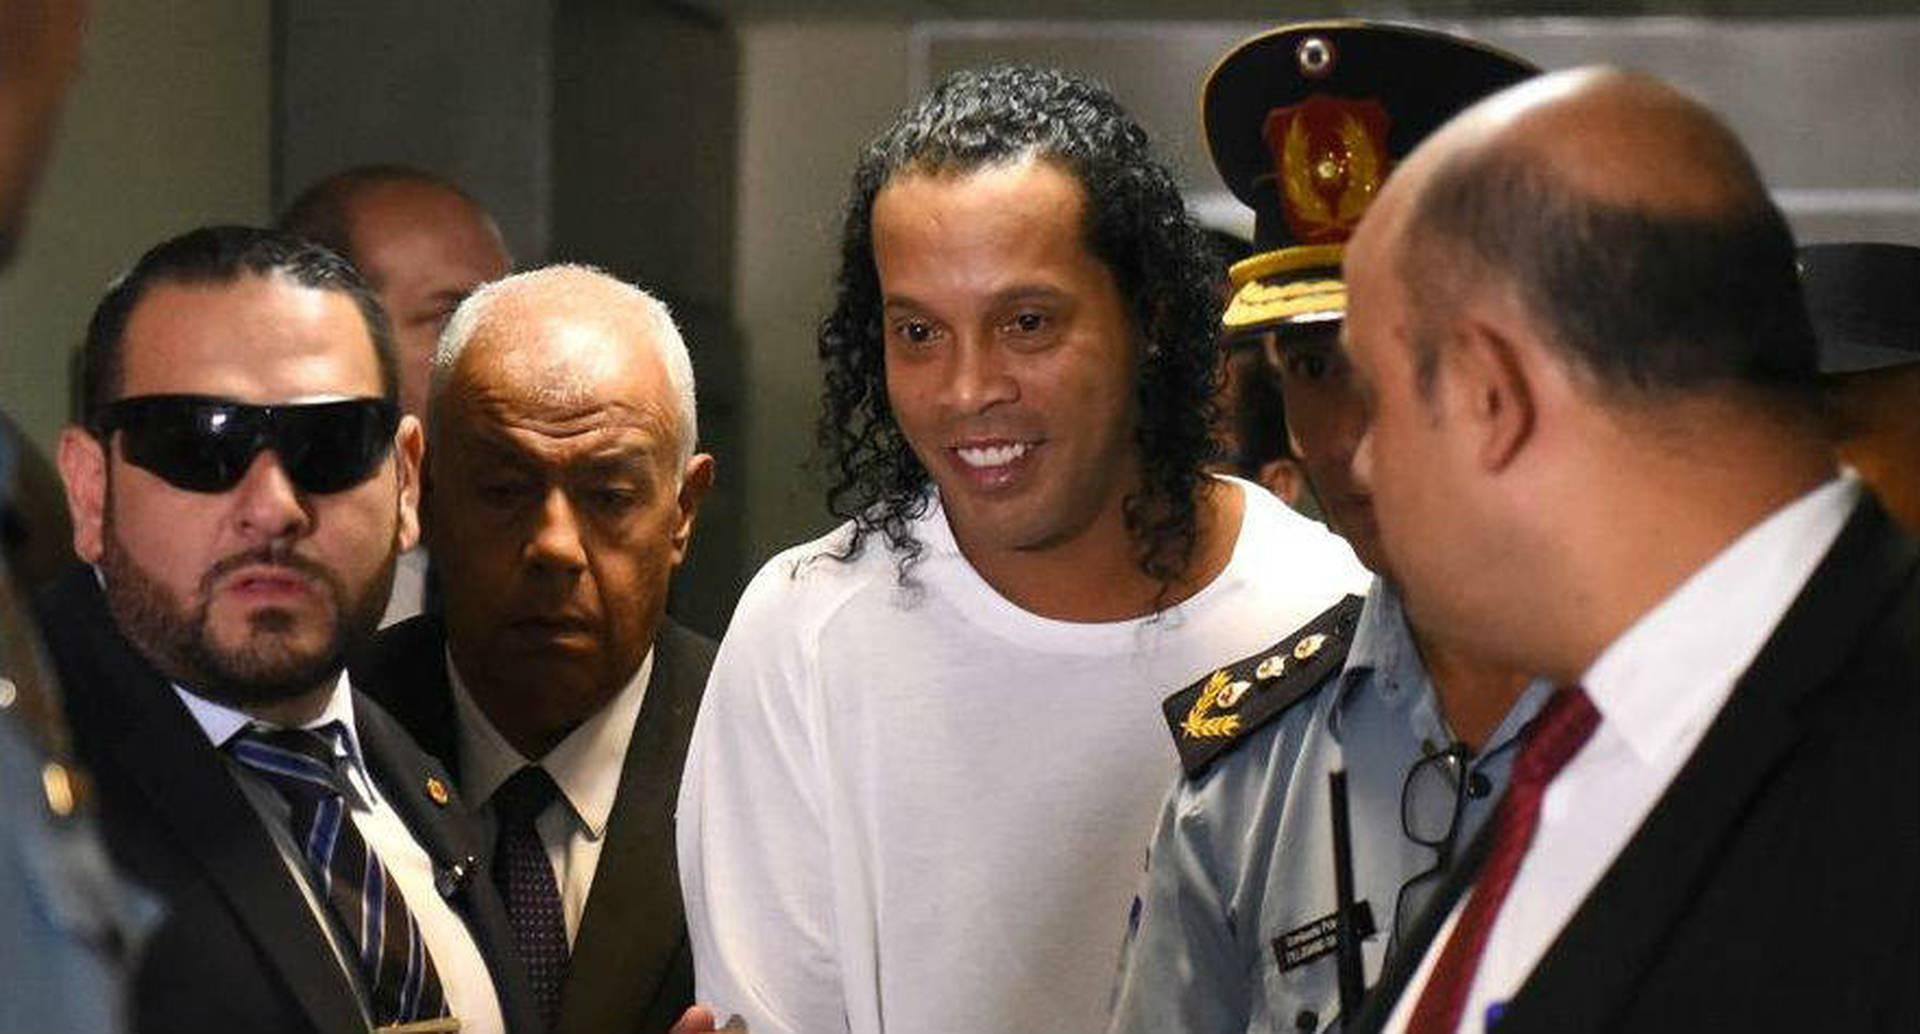 Ronaldinho queda en libertad tras seis meses detenido en Paraguay